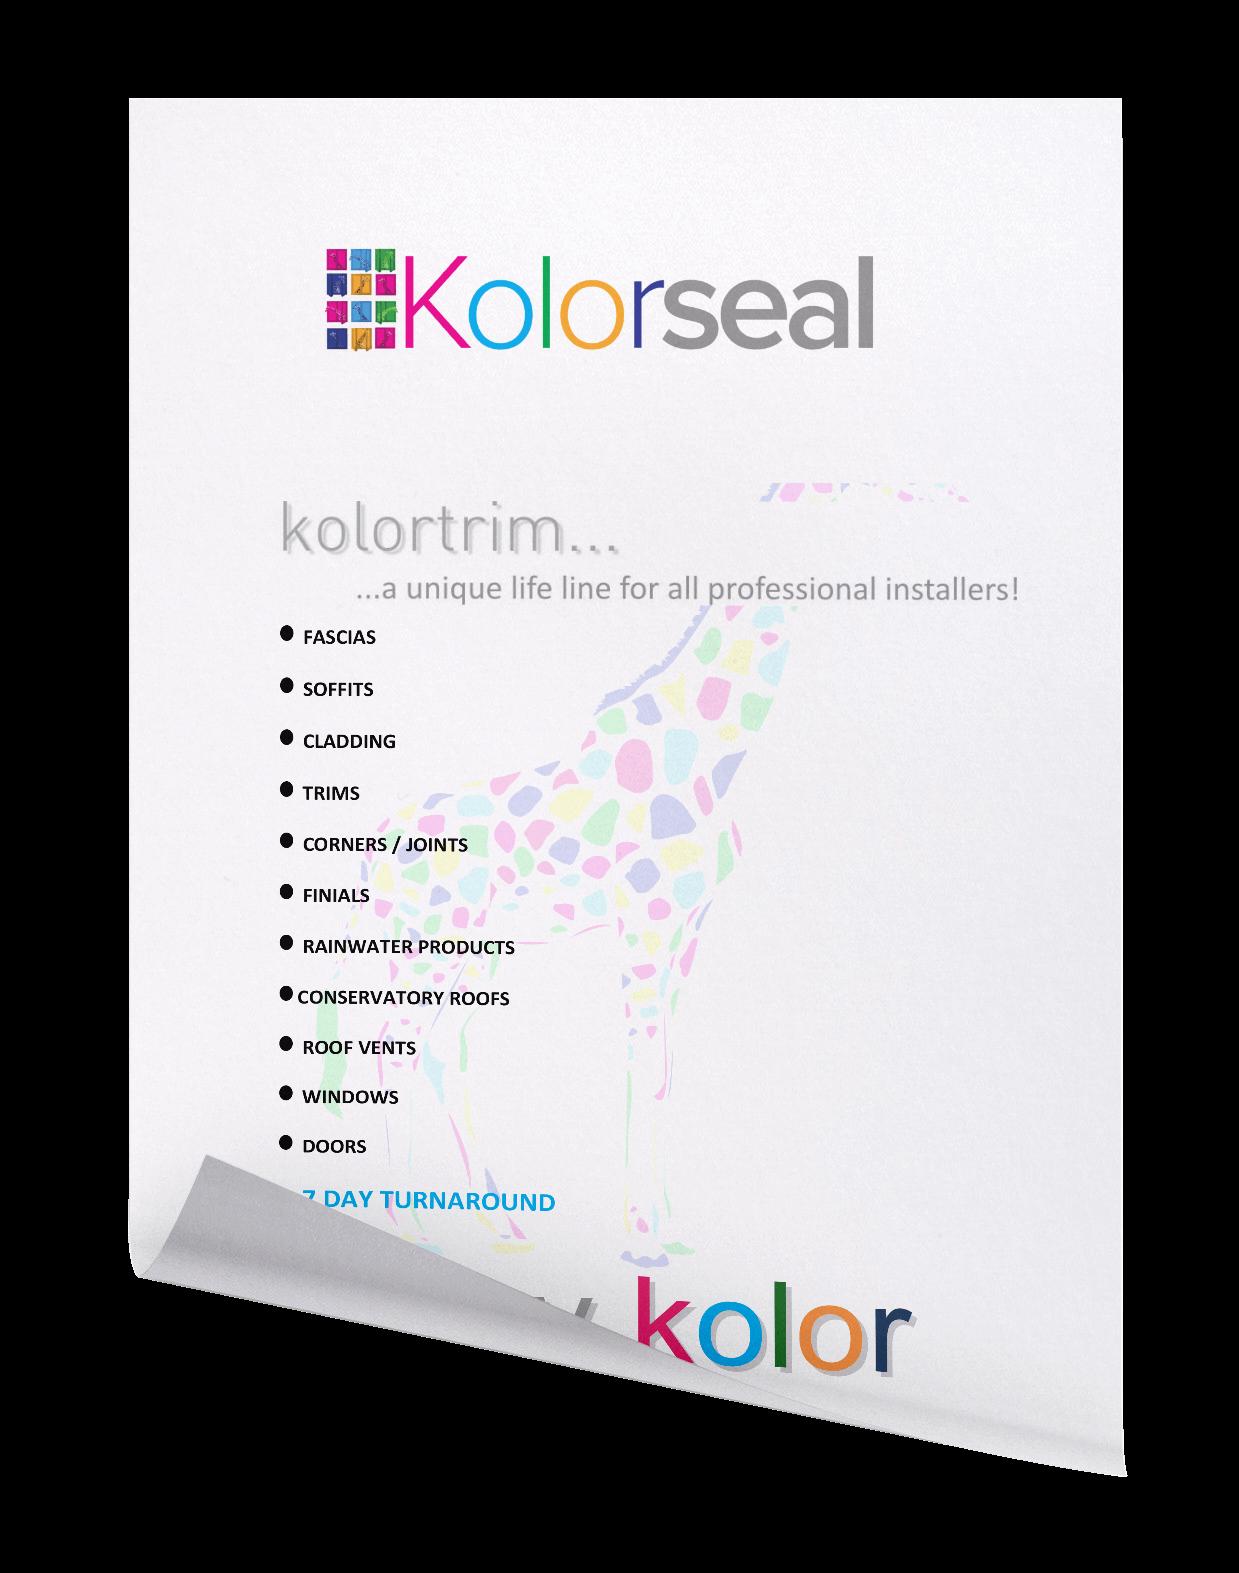 Kolorseal colour info